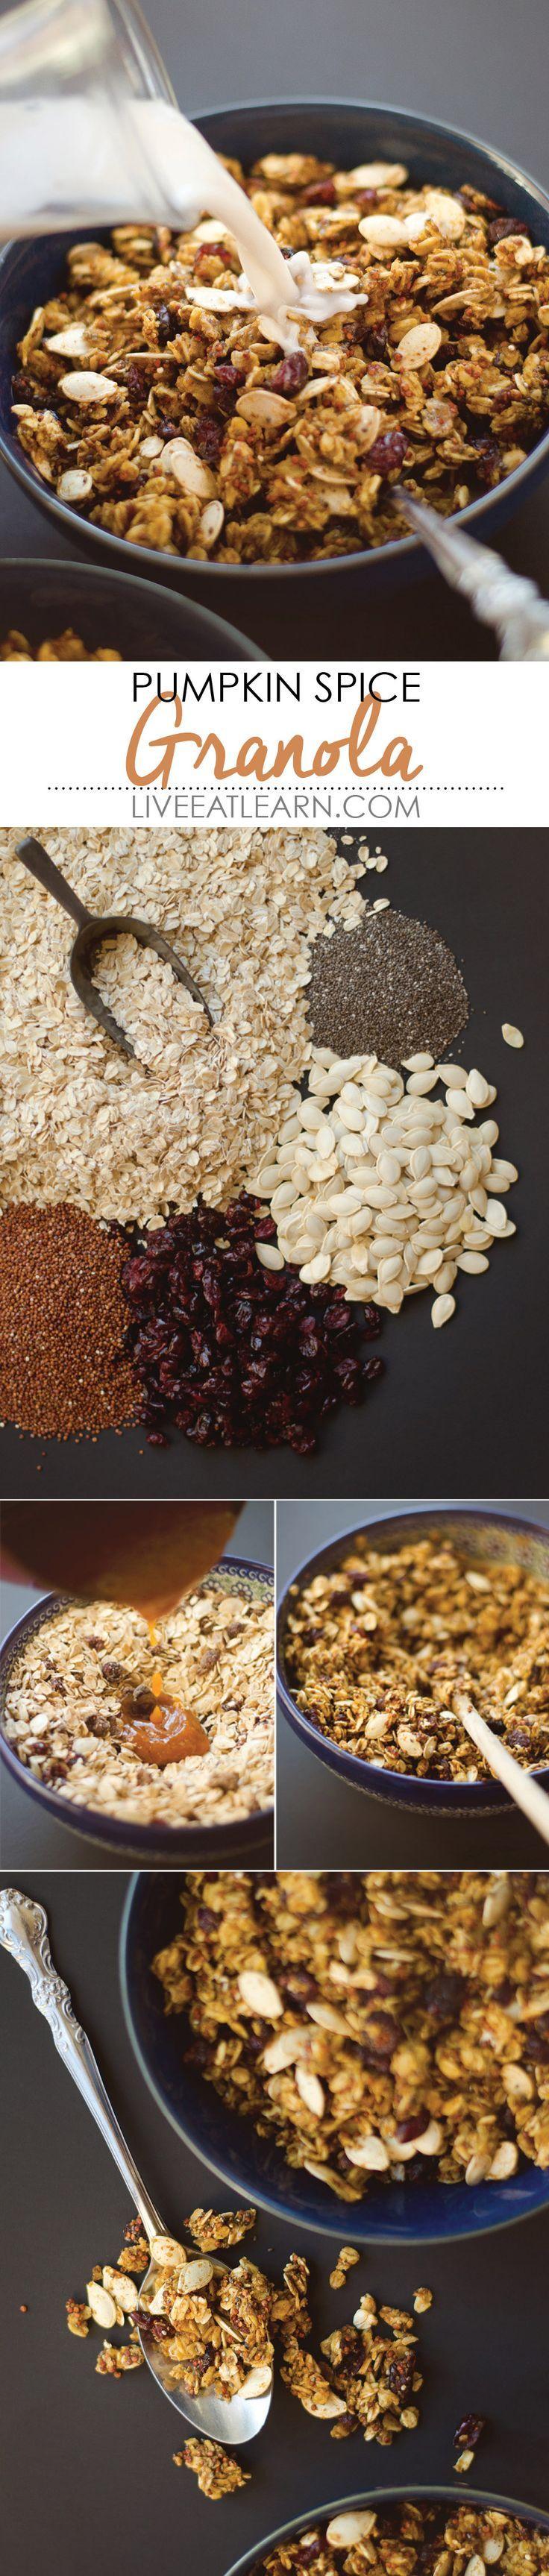 Pumpkin puree, pumpkin seeds, and pumpkin spice make up this cozy, nut-free, vegan granola. #nutfree #breakfast